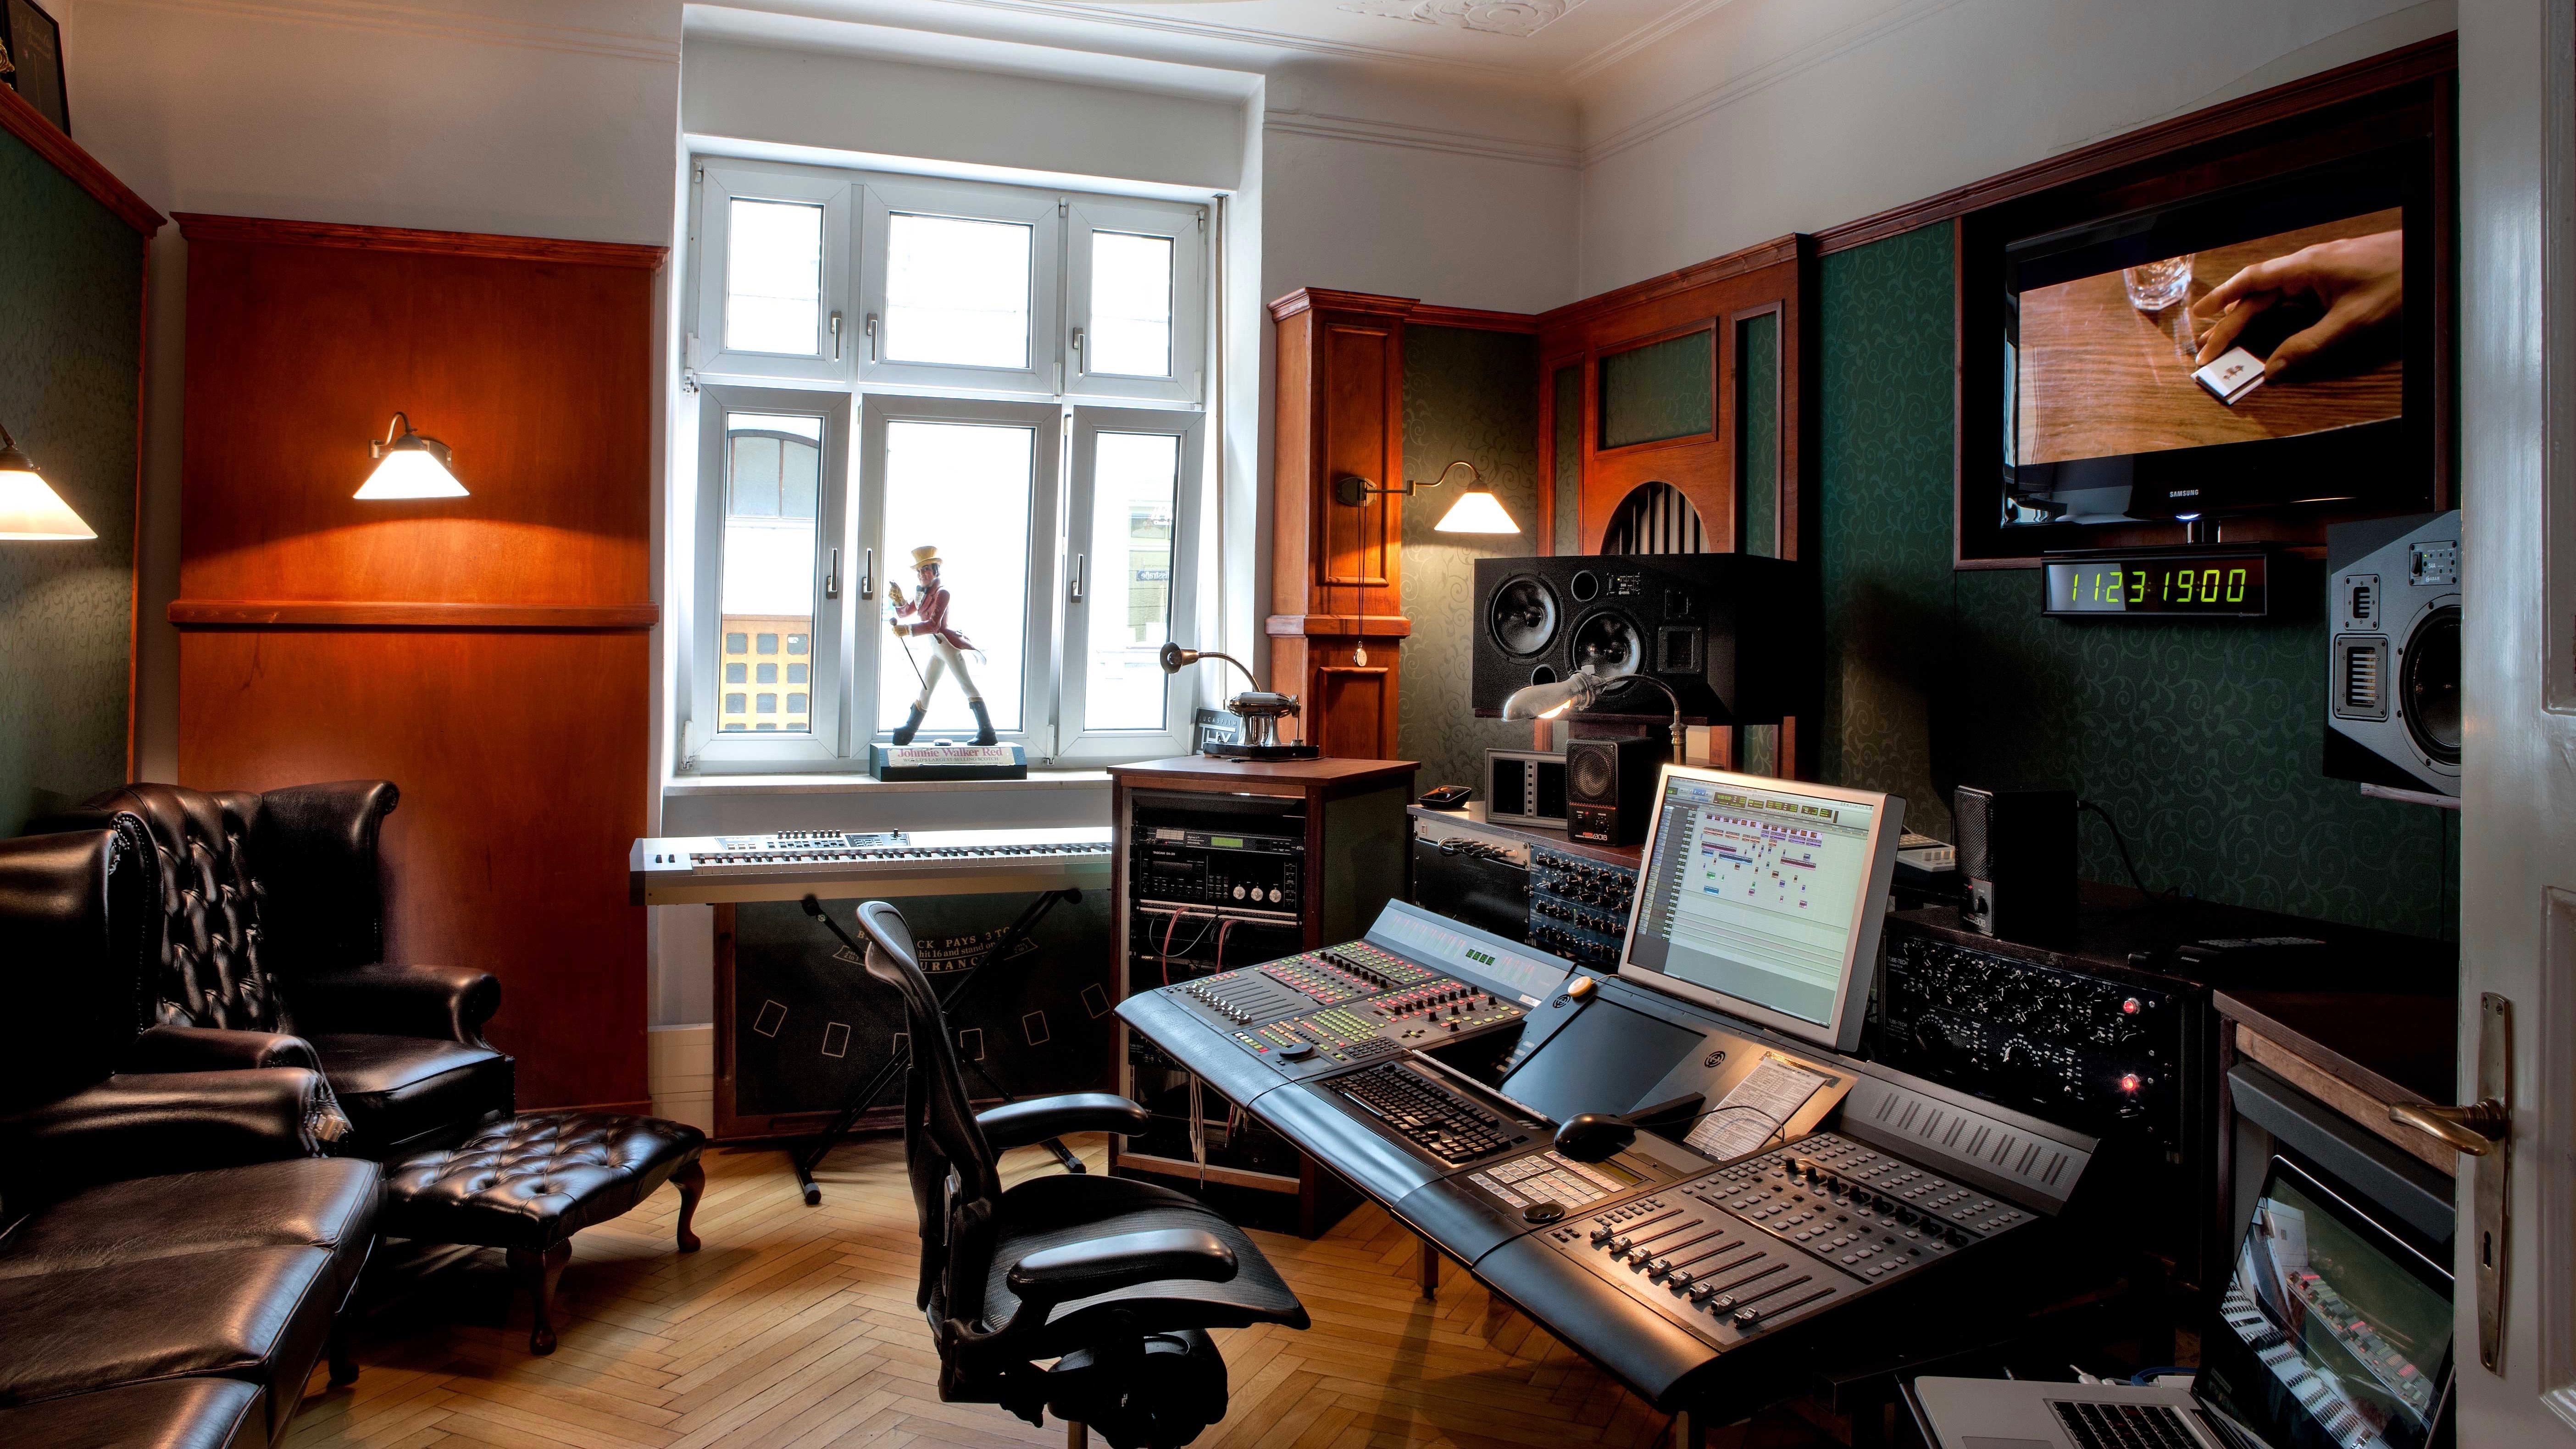 NEUE WESTPARK STUDIOS Tonstudio München, Sprachaufnahmen, Radiowerbung